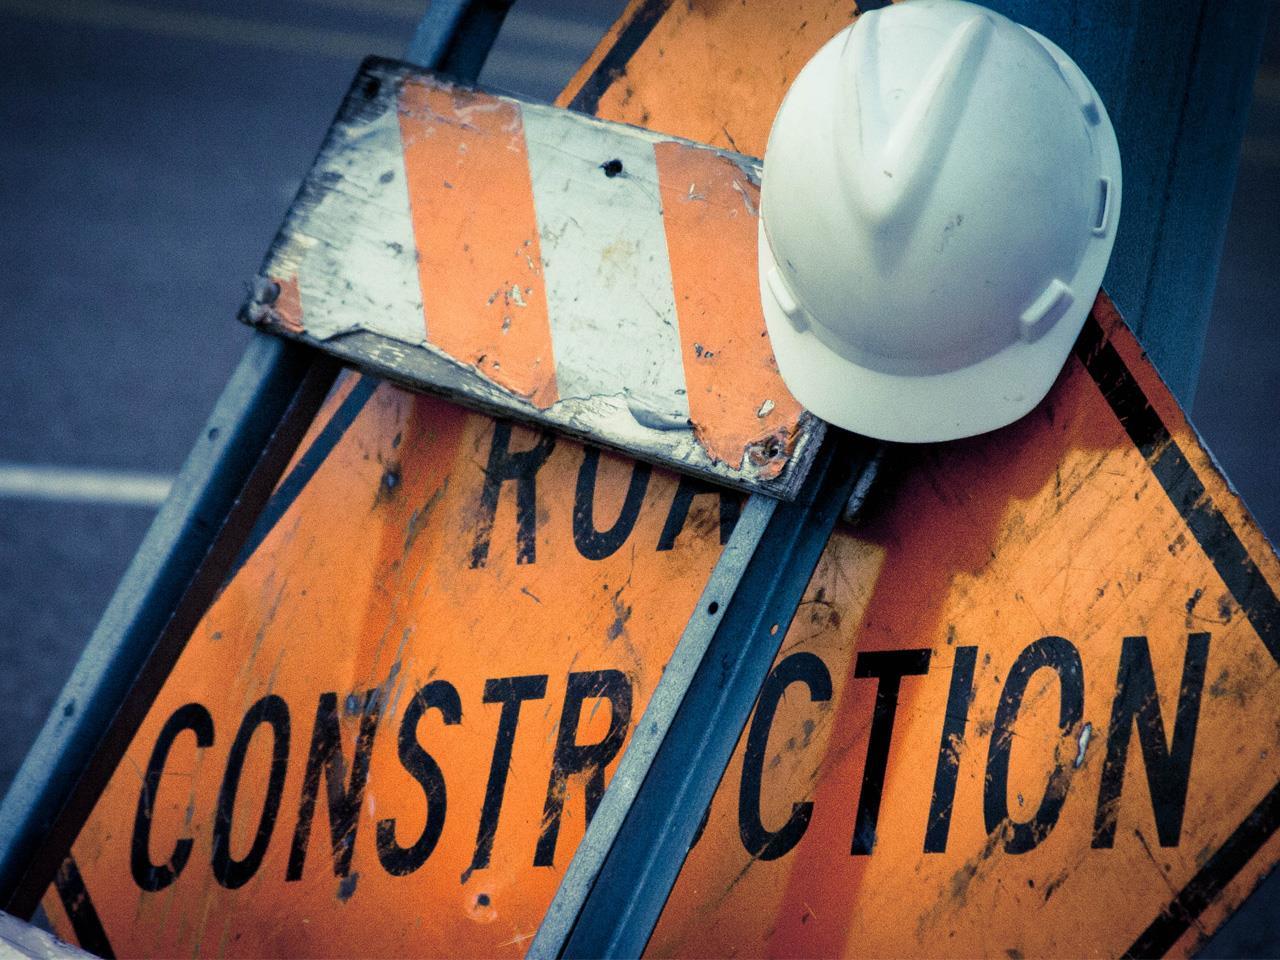 Road construction_211547